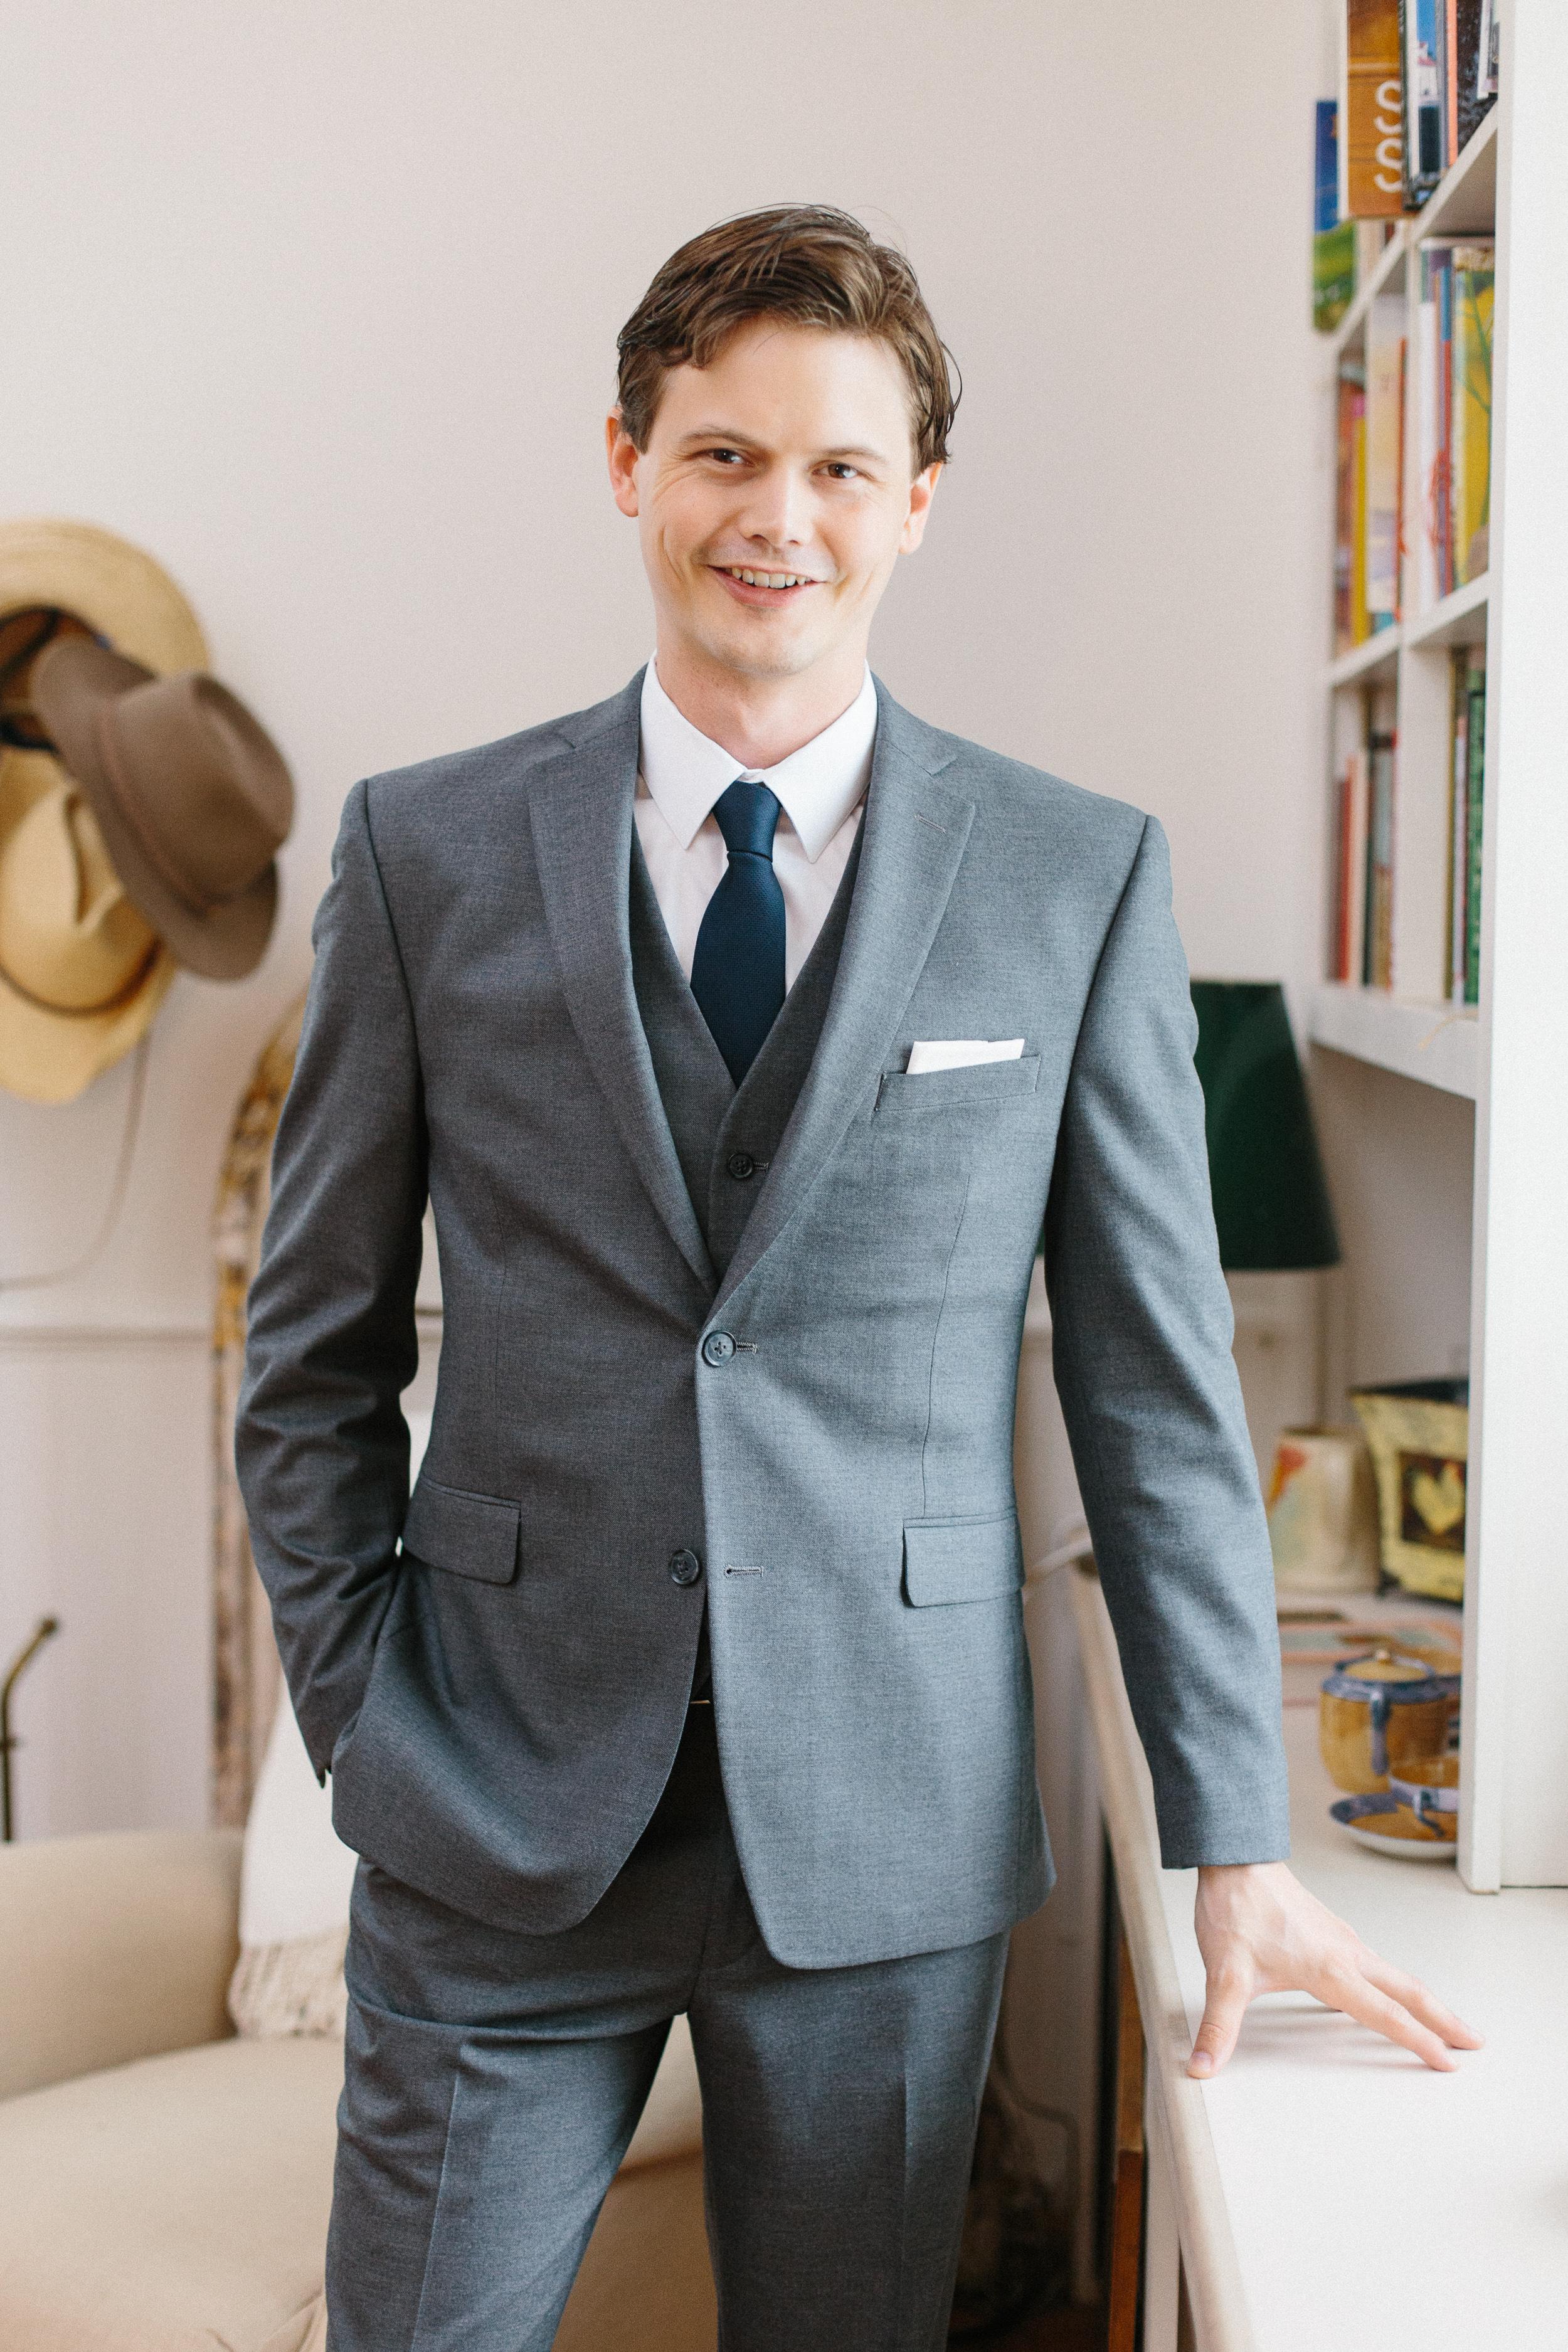 groom-formal-portrait-on-wedding-day